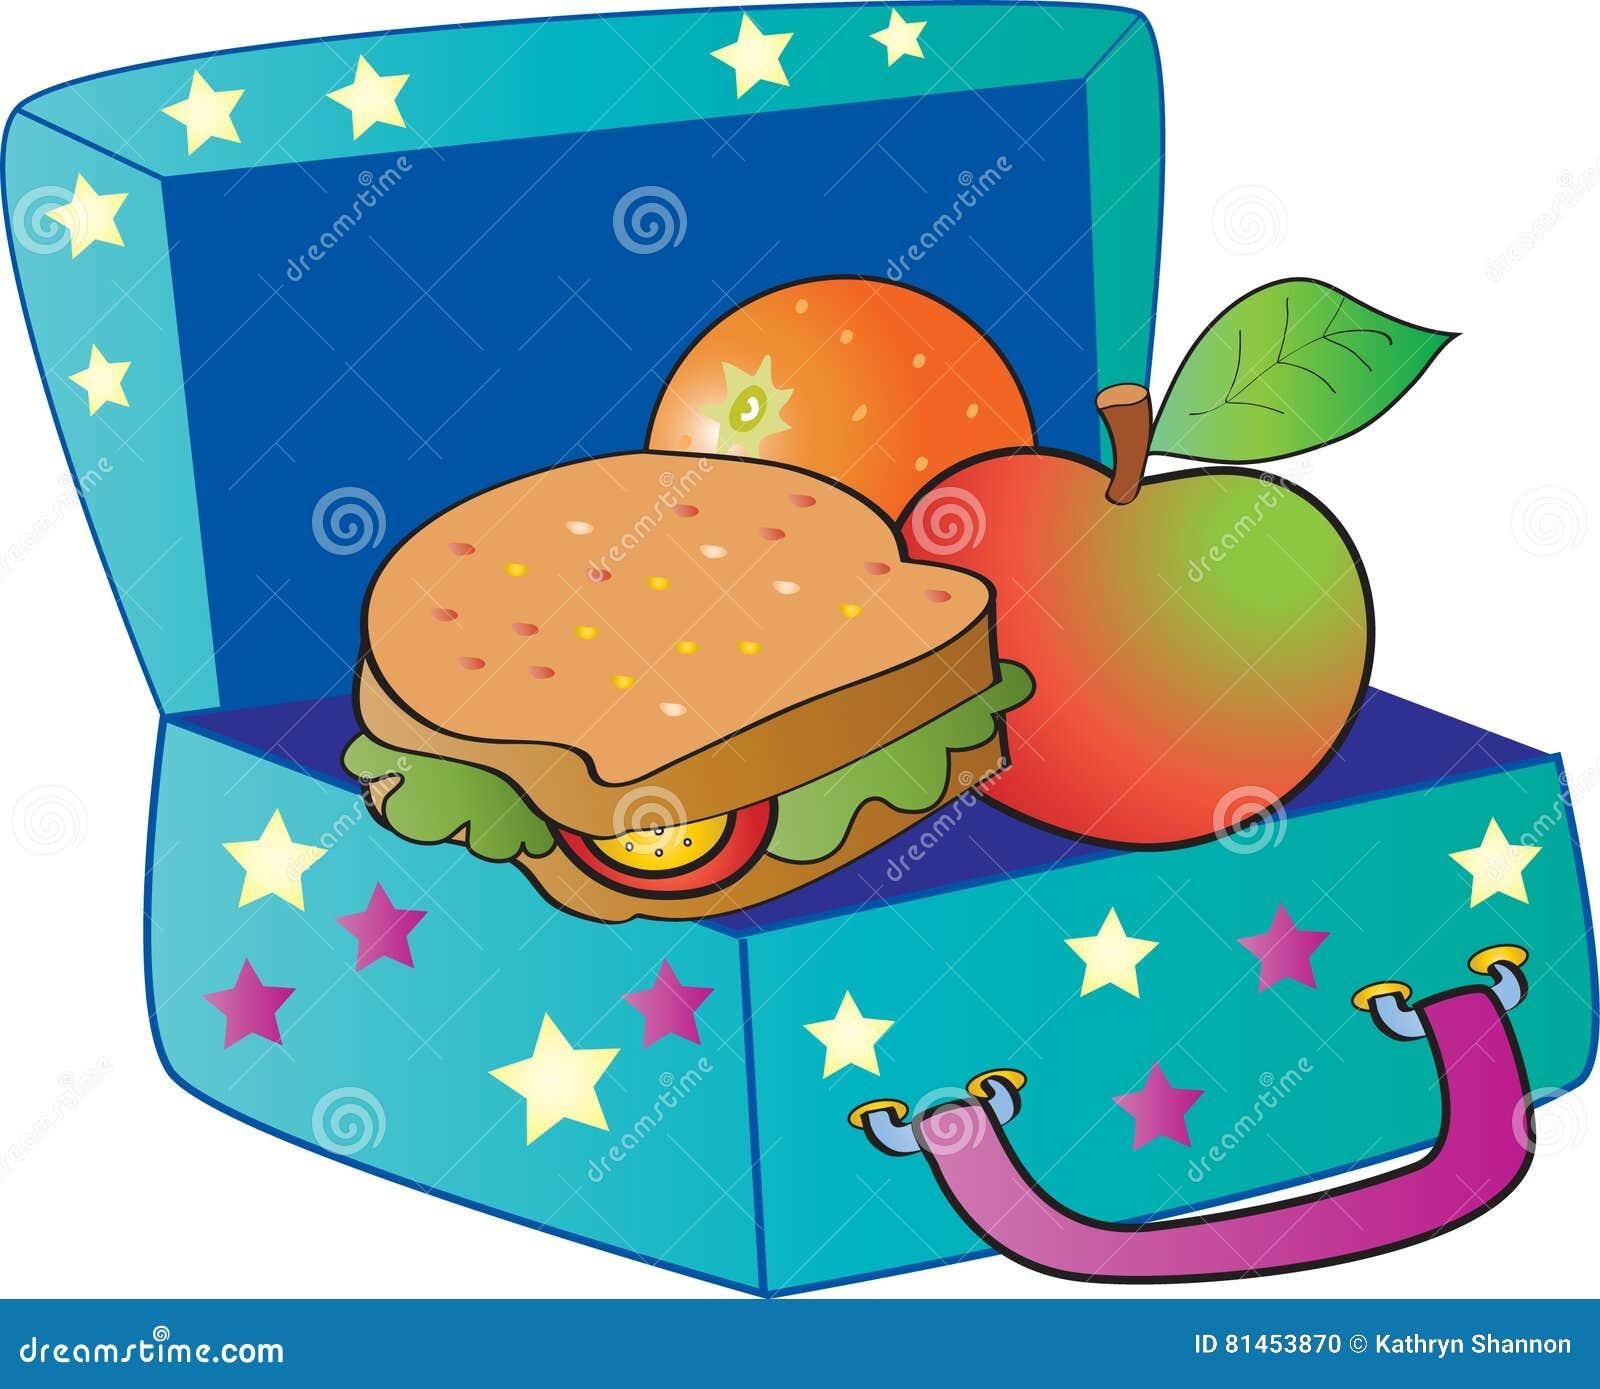 lunch box clipart free - Jaxstorm.realverse.us